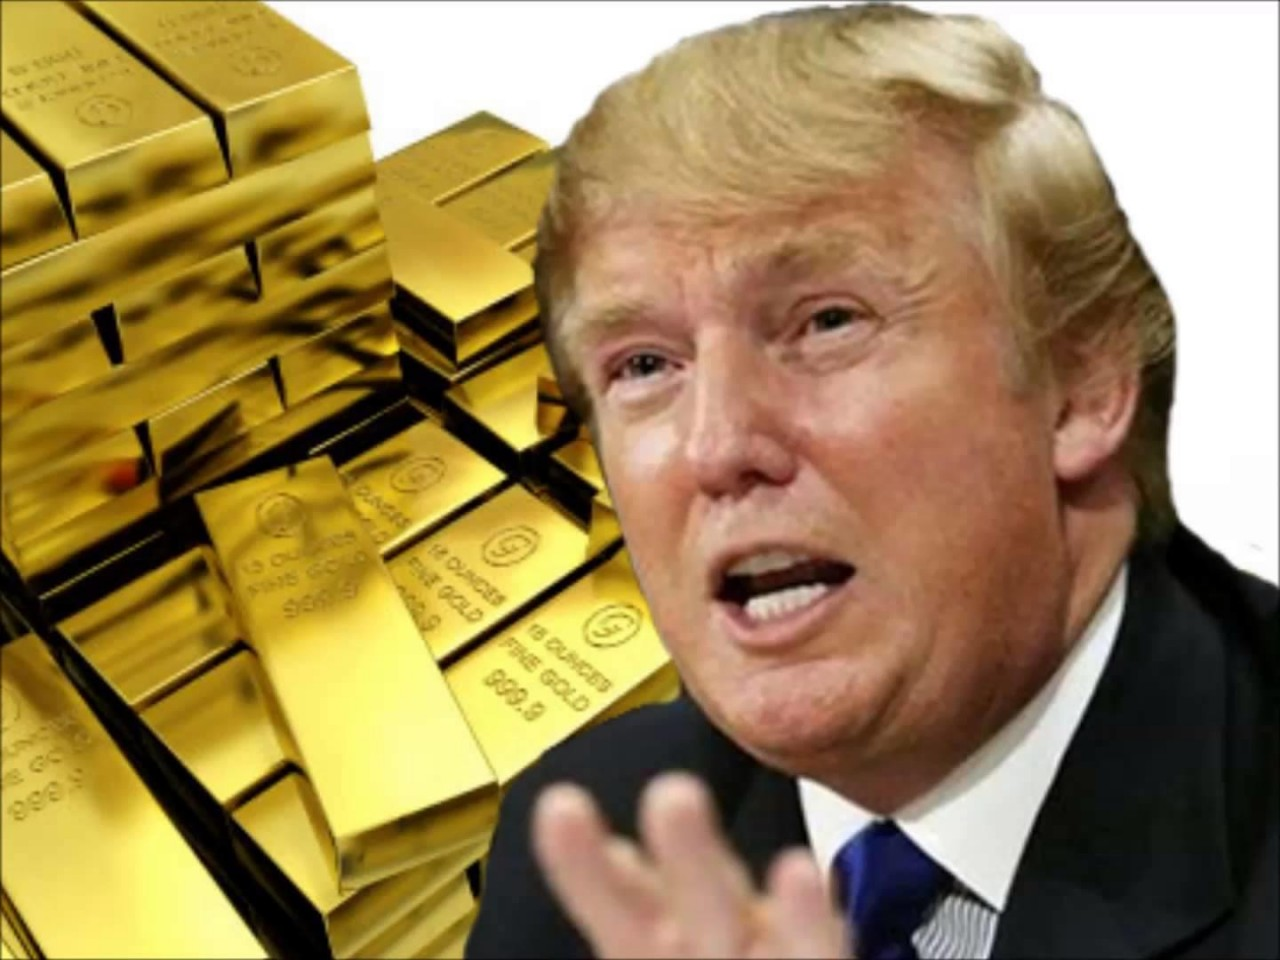 Золотой запас Трампа: какую тайну доллара скрывает рост цен на золото